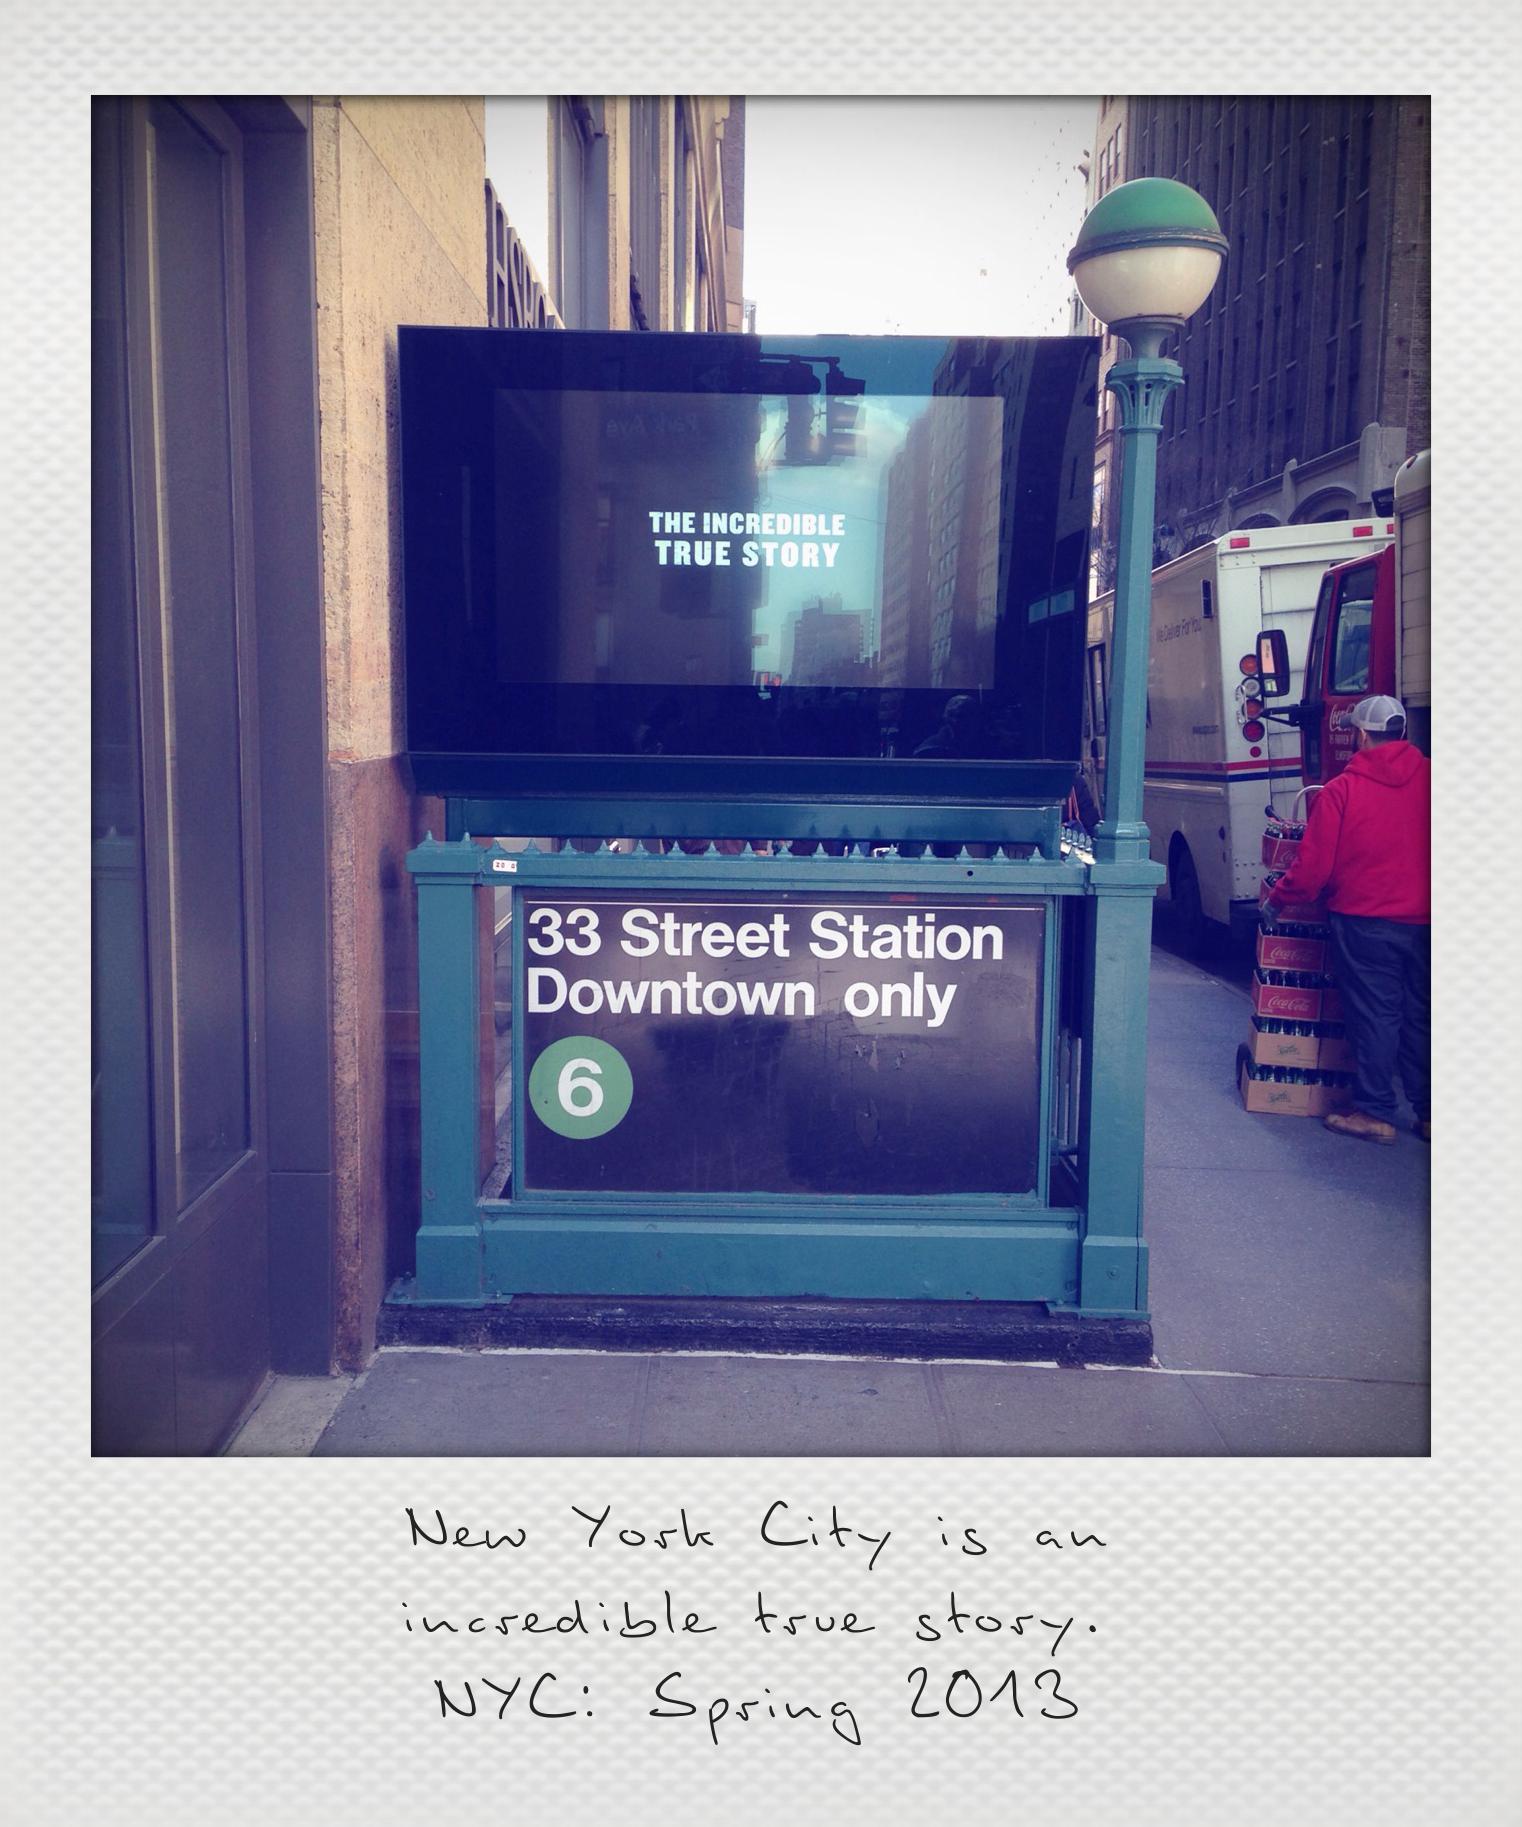 No 6 Train3_instant